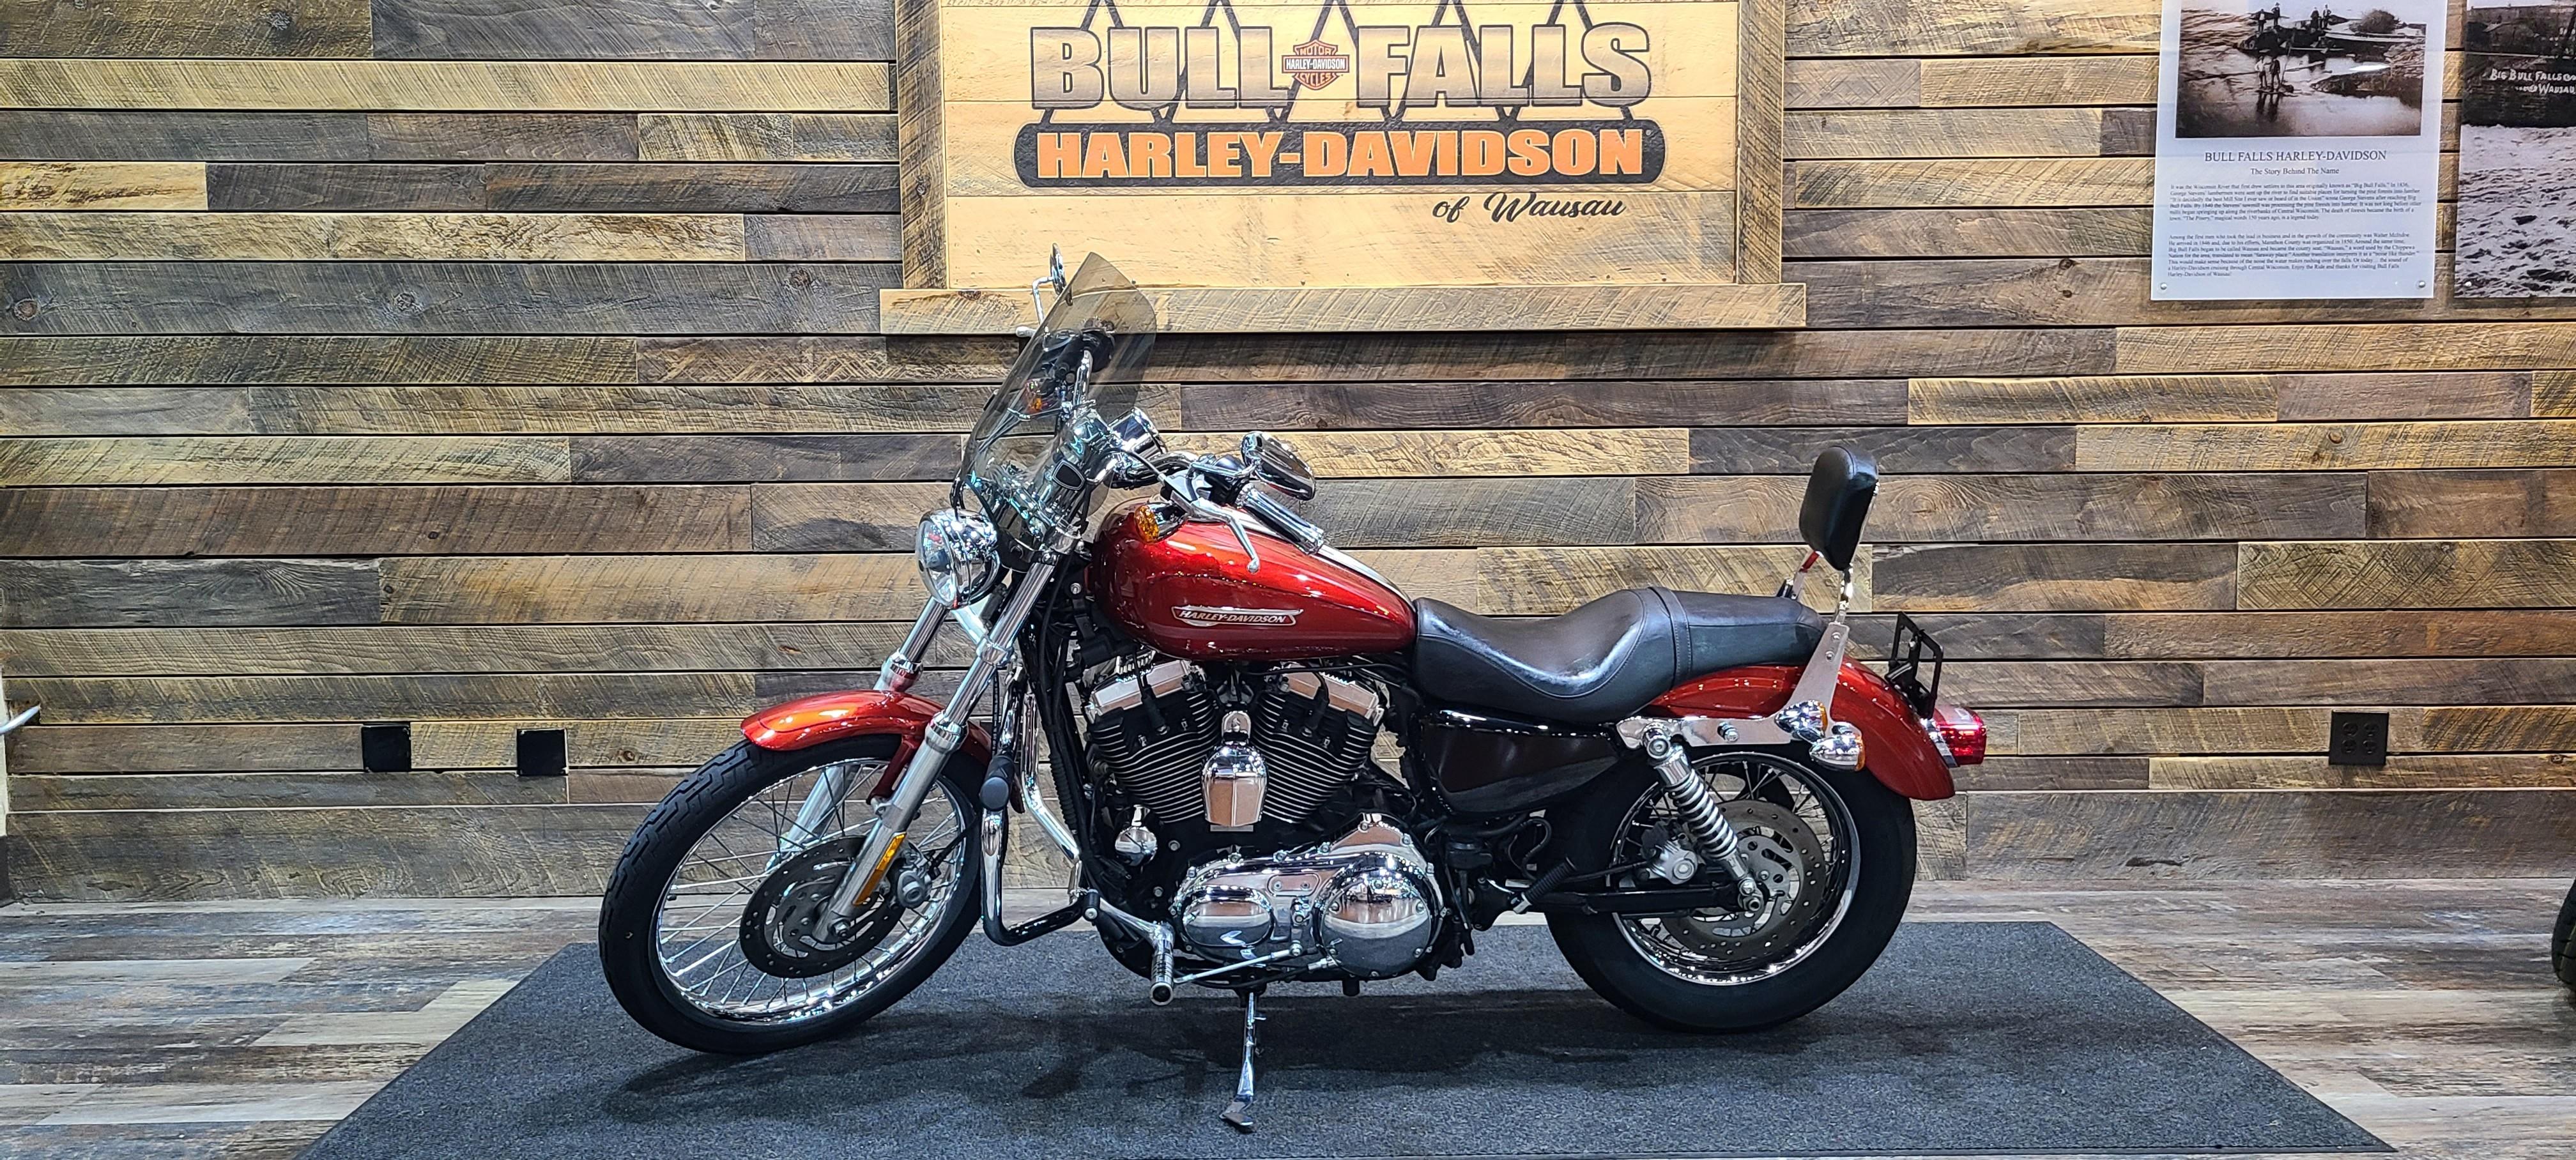 2008 Harley-Davidson Sportster 1200 Custom at Bull Falls Harley-Davidson